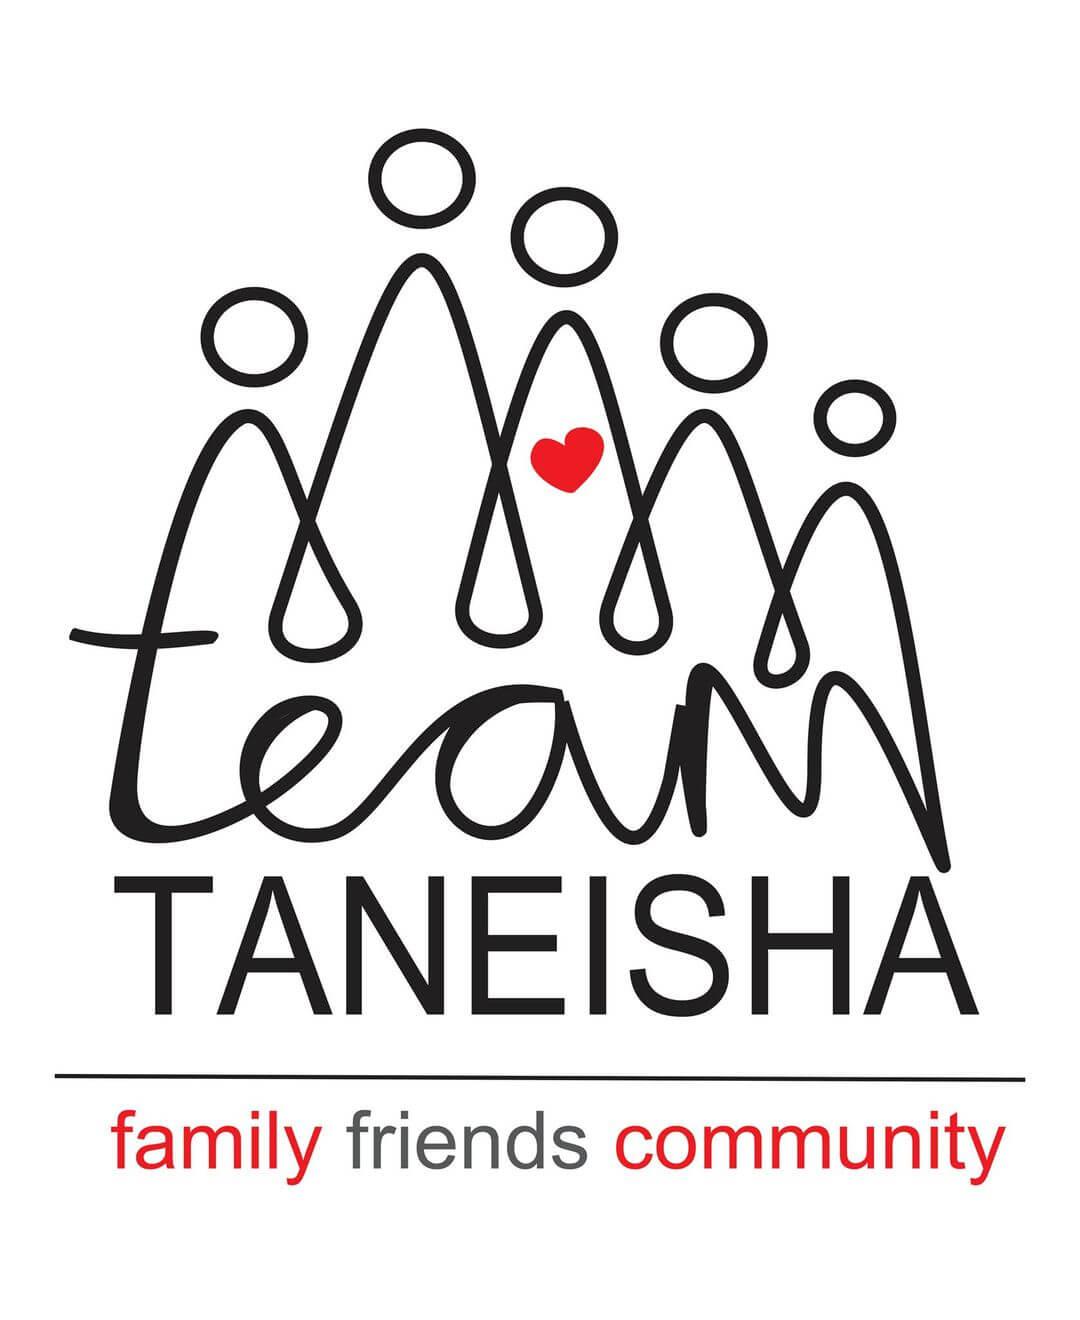 team taneisha